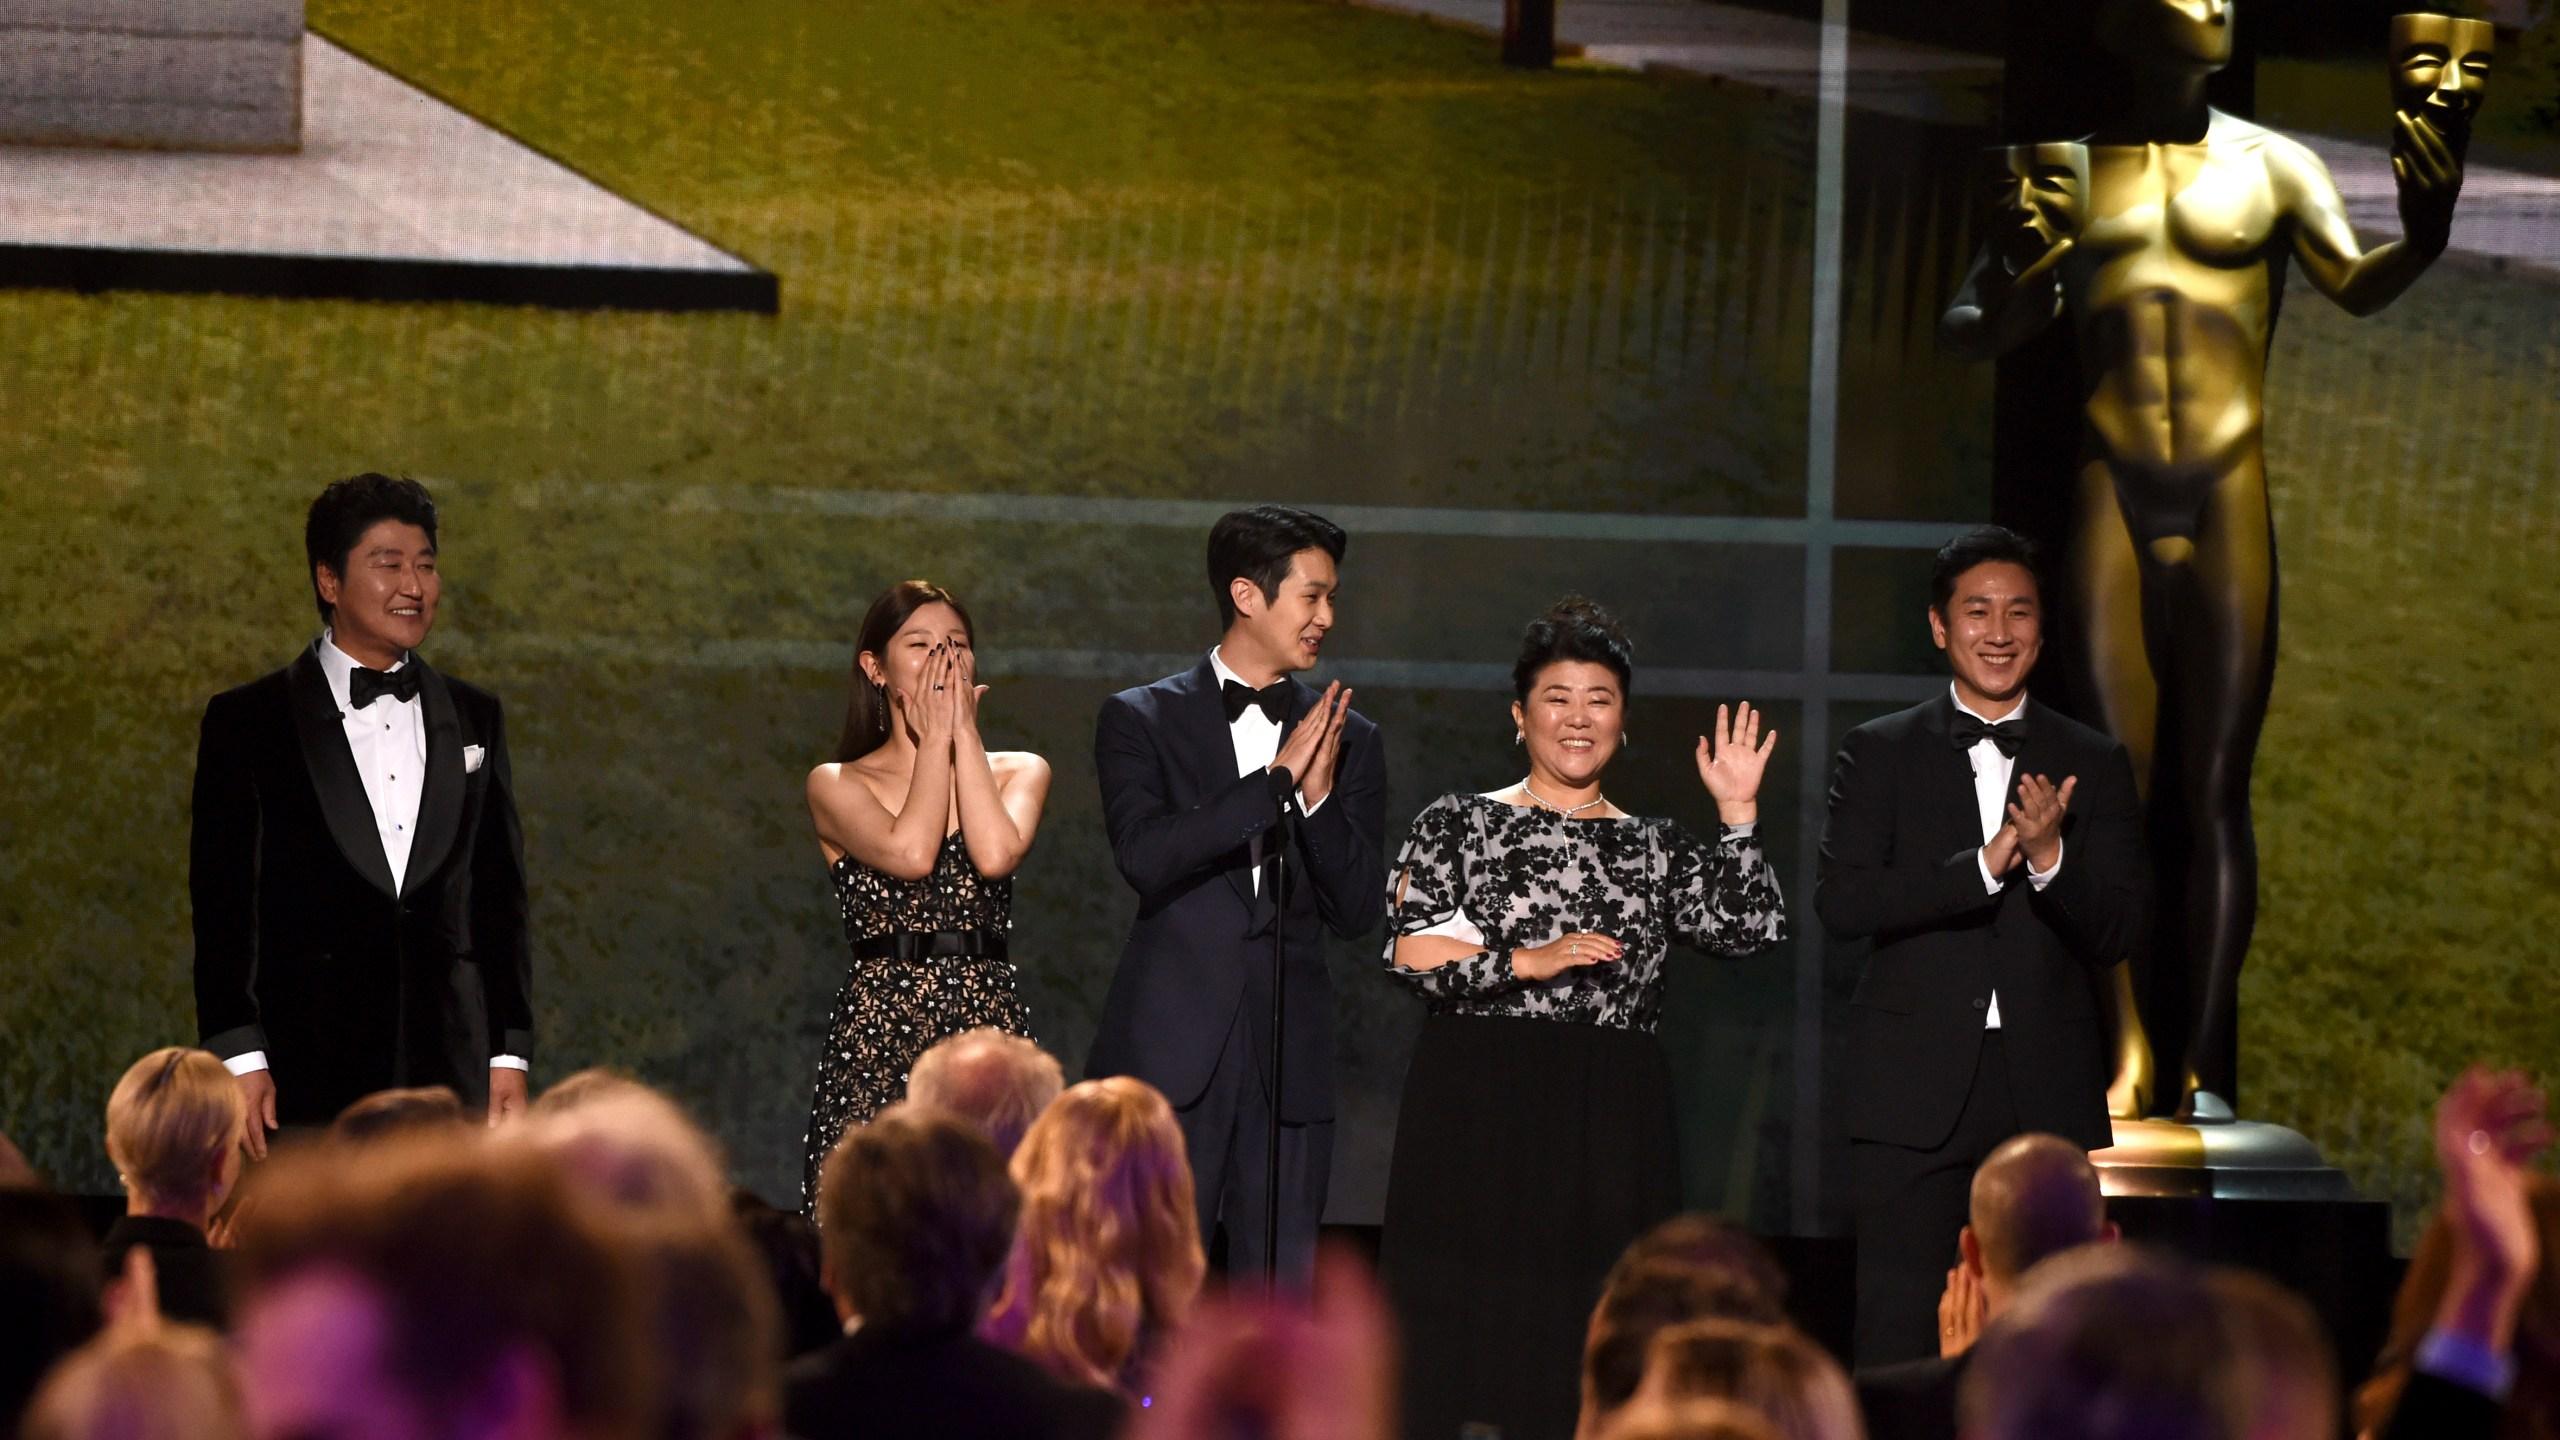 Kang-Ho Song, Park So Dam, Choi Woo-shik, Lee Jeong-eun, Lee Sun Gyun